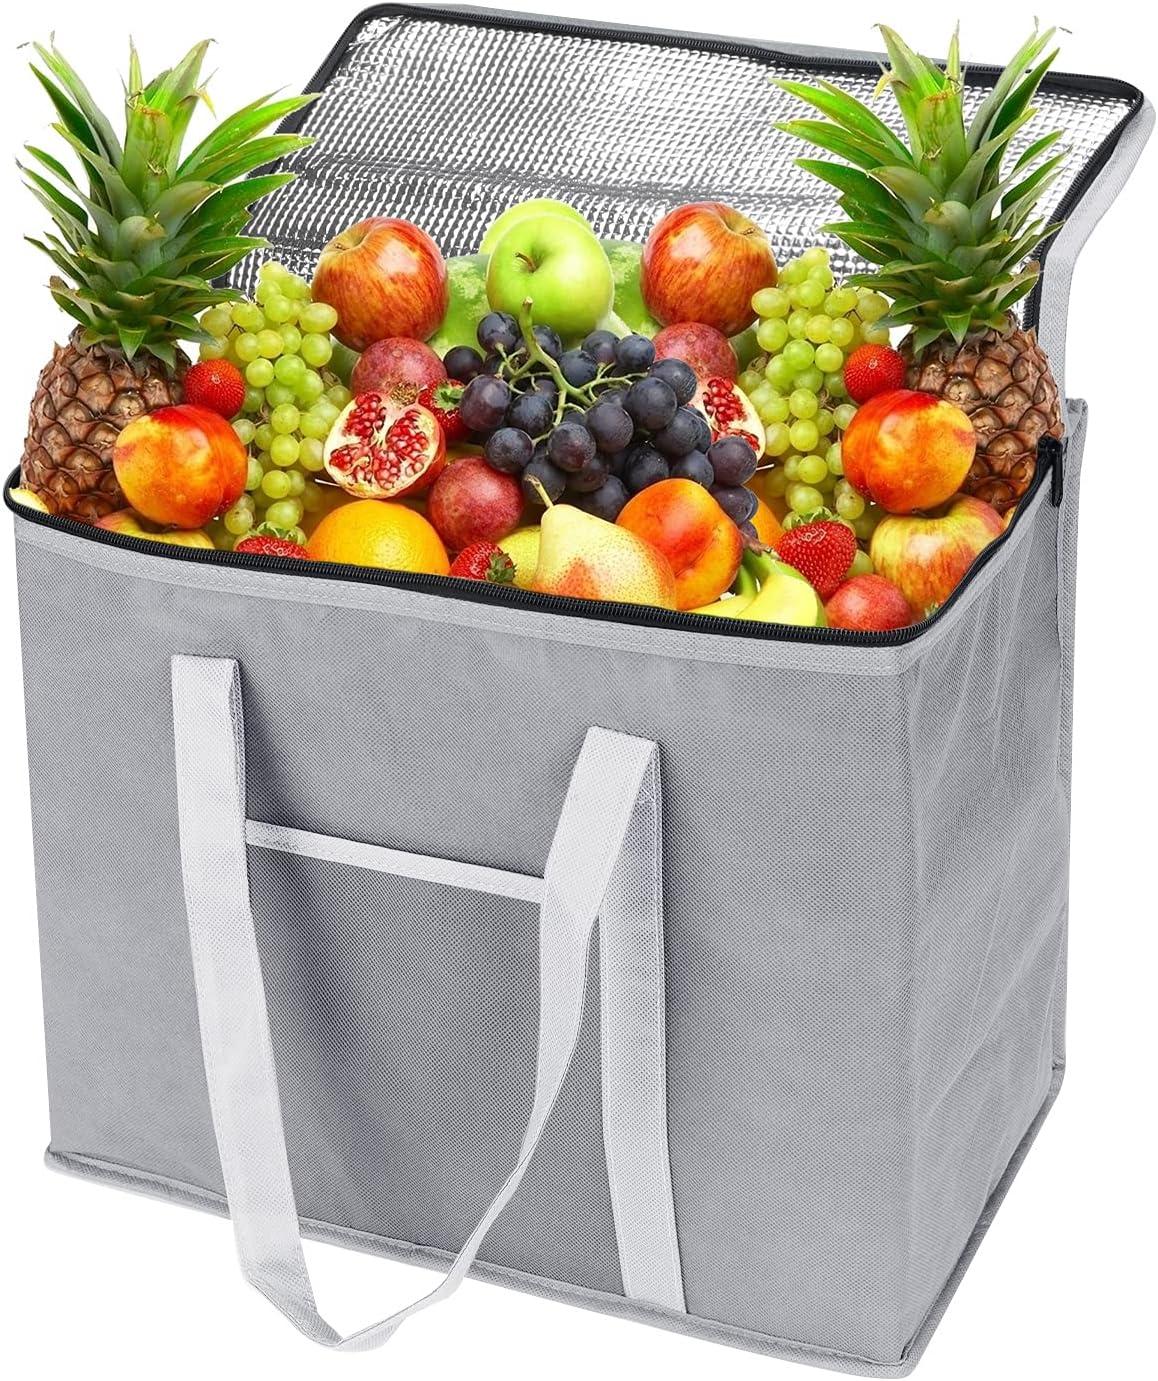 Bolsa termica, bolsa isotermica de 30 litros, bolsa termica porta alimentos, bolsa almuerzo, bolsa nevera para camping, barbacoa, compras, pesca, actividades familiares al aire libre